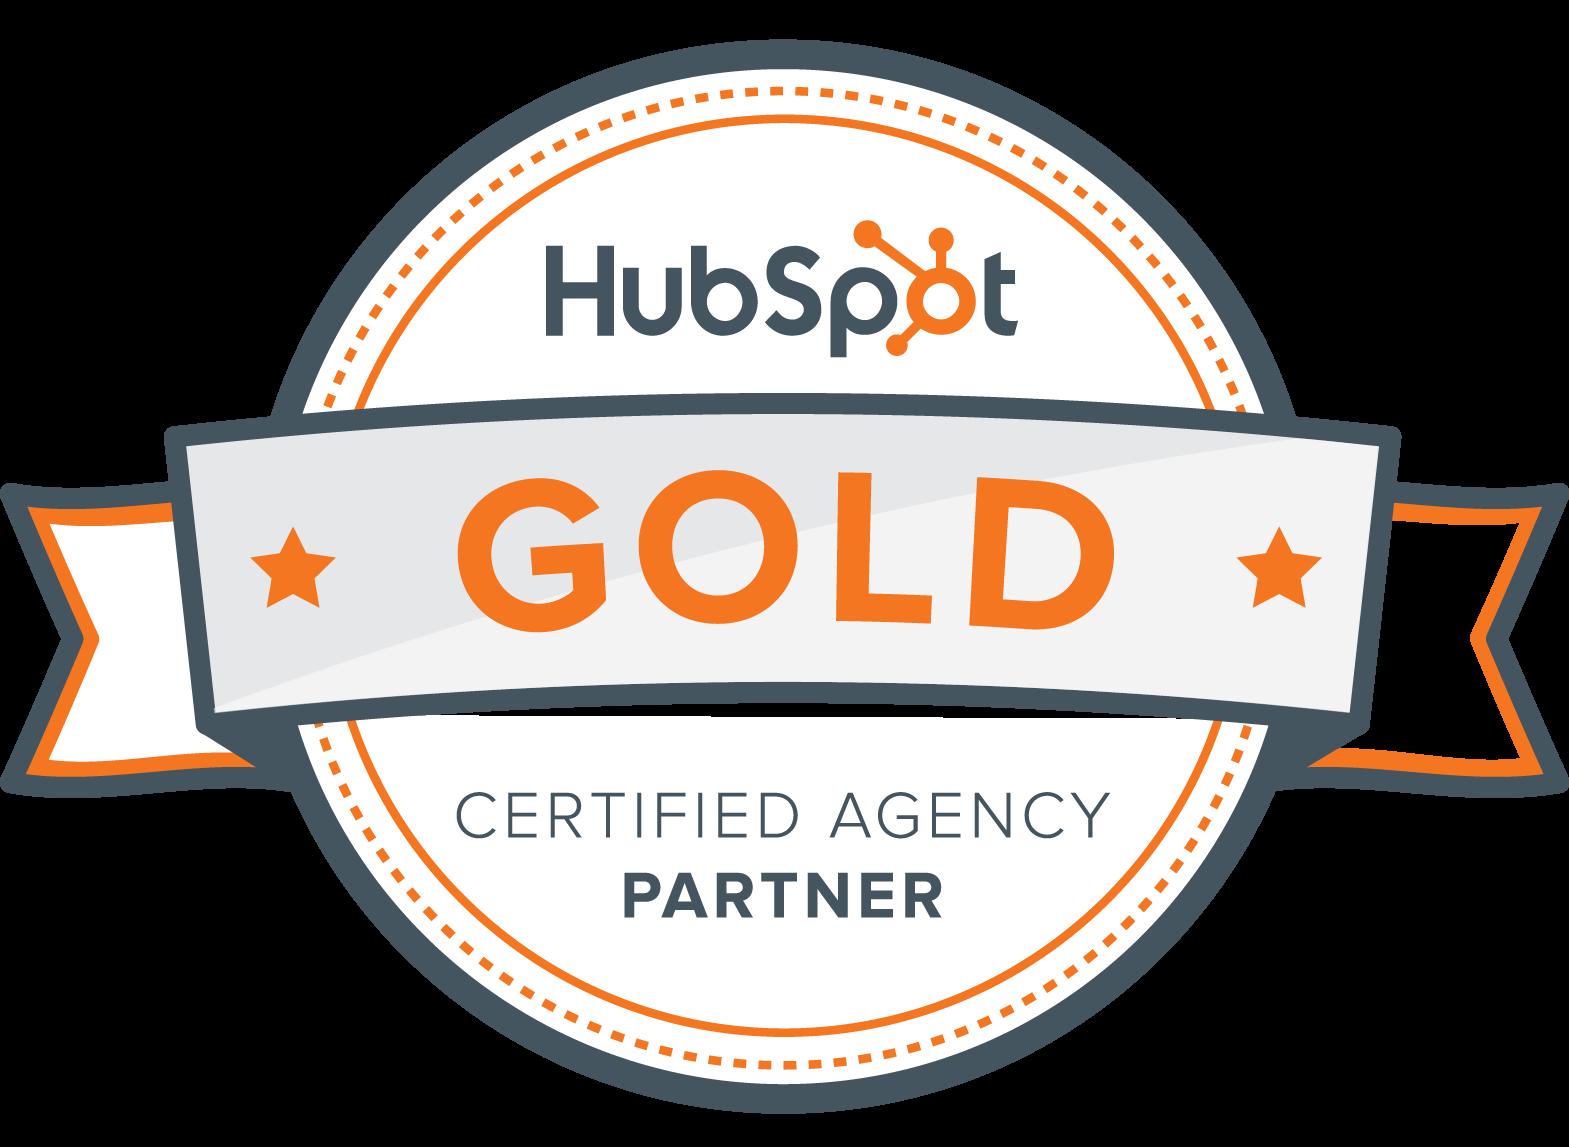 HubSpot Gold Agency Partners